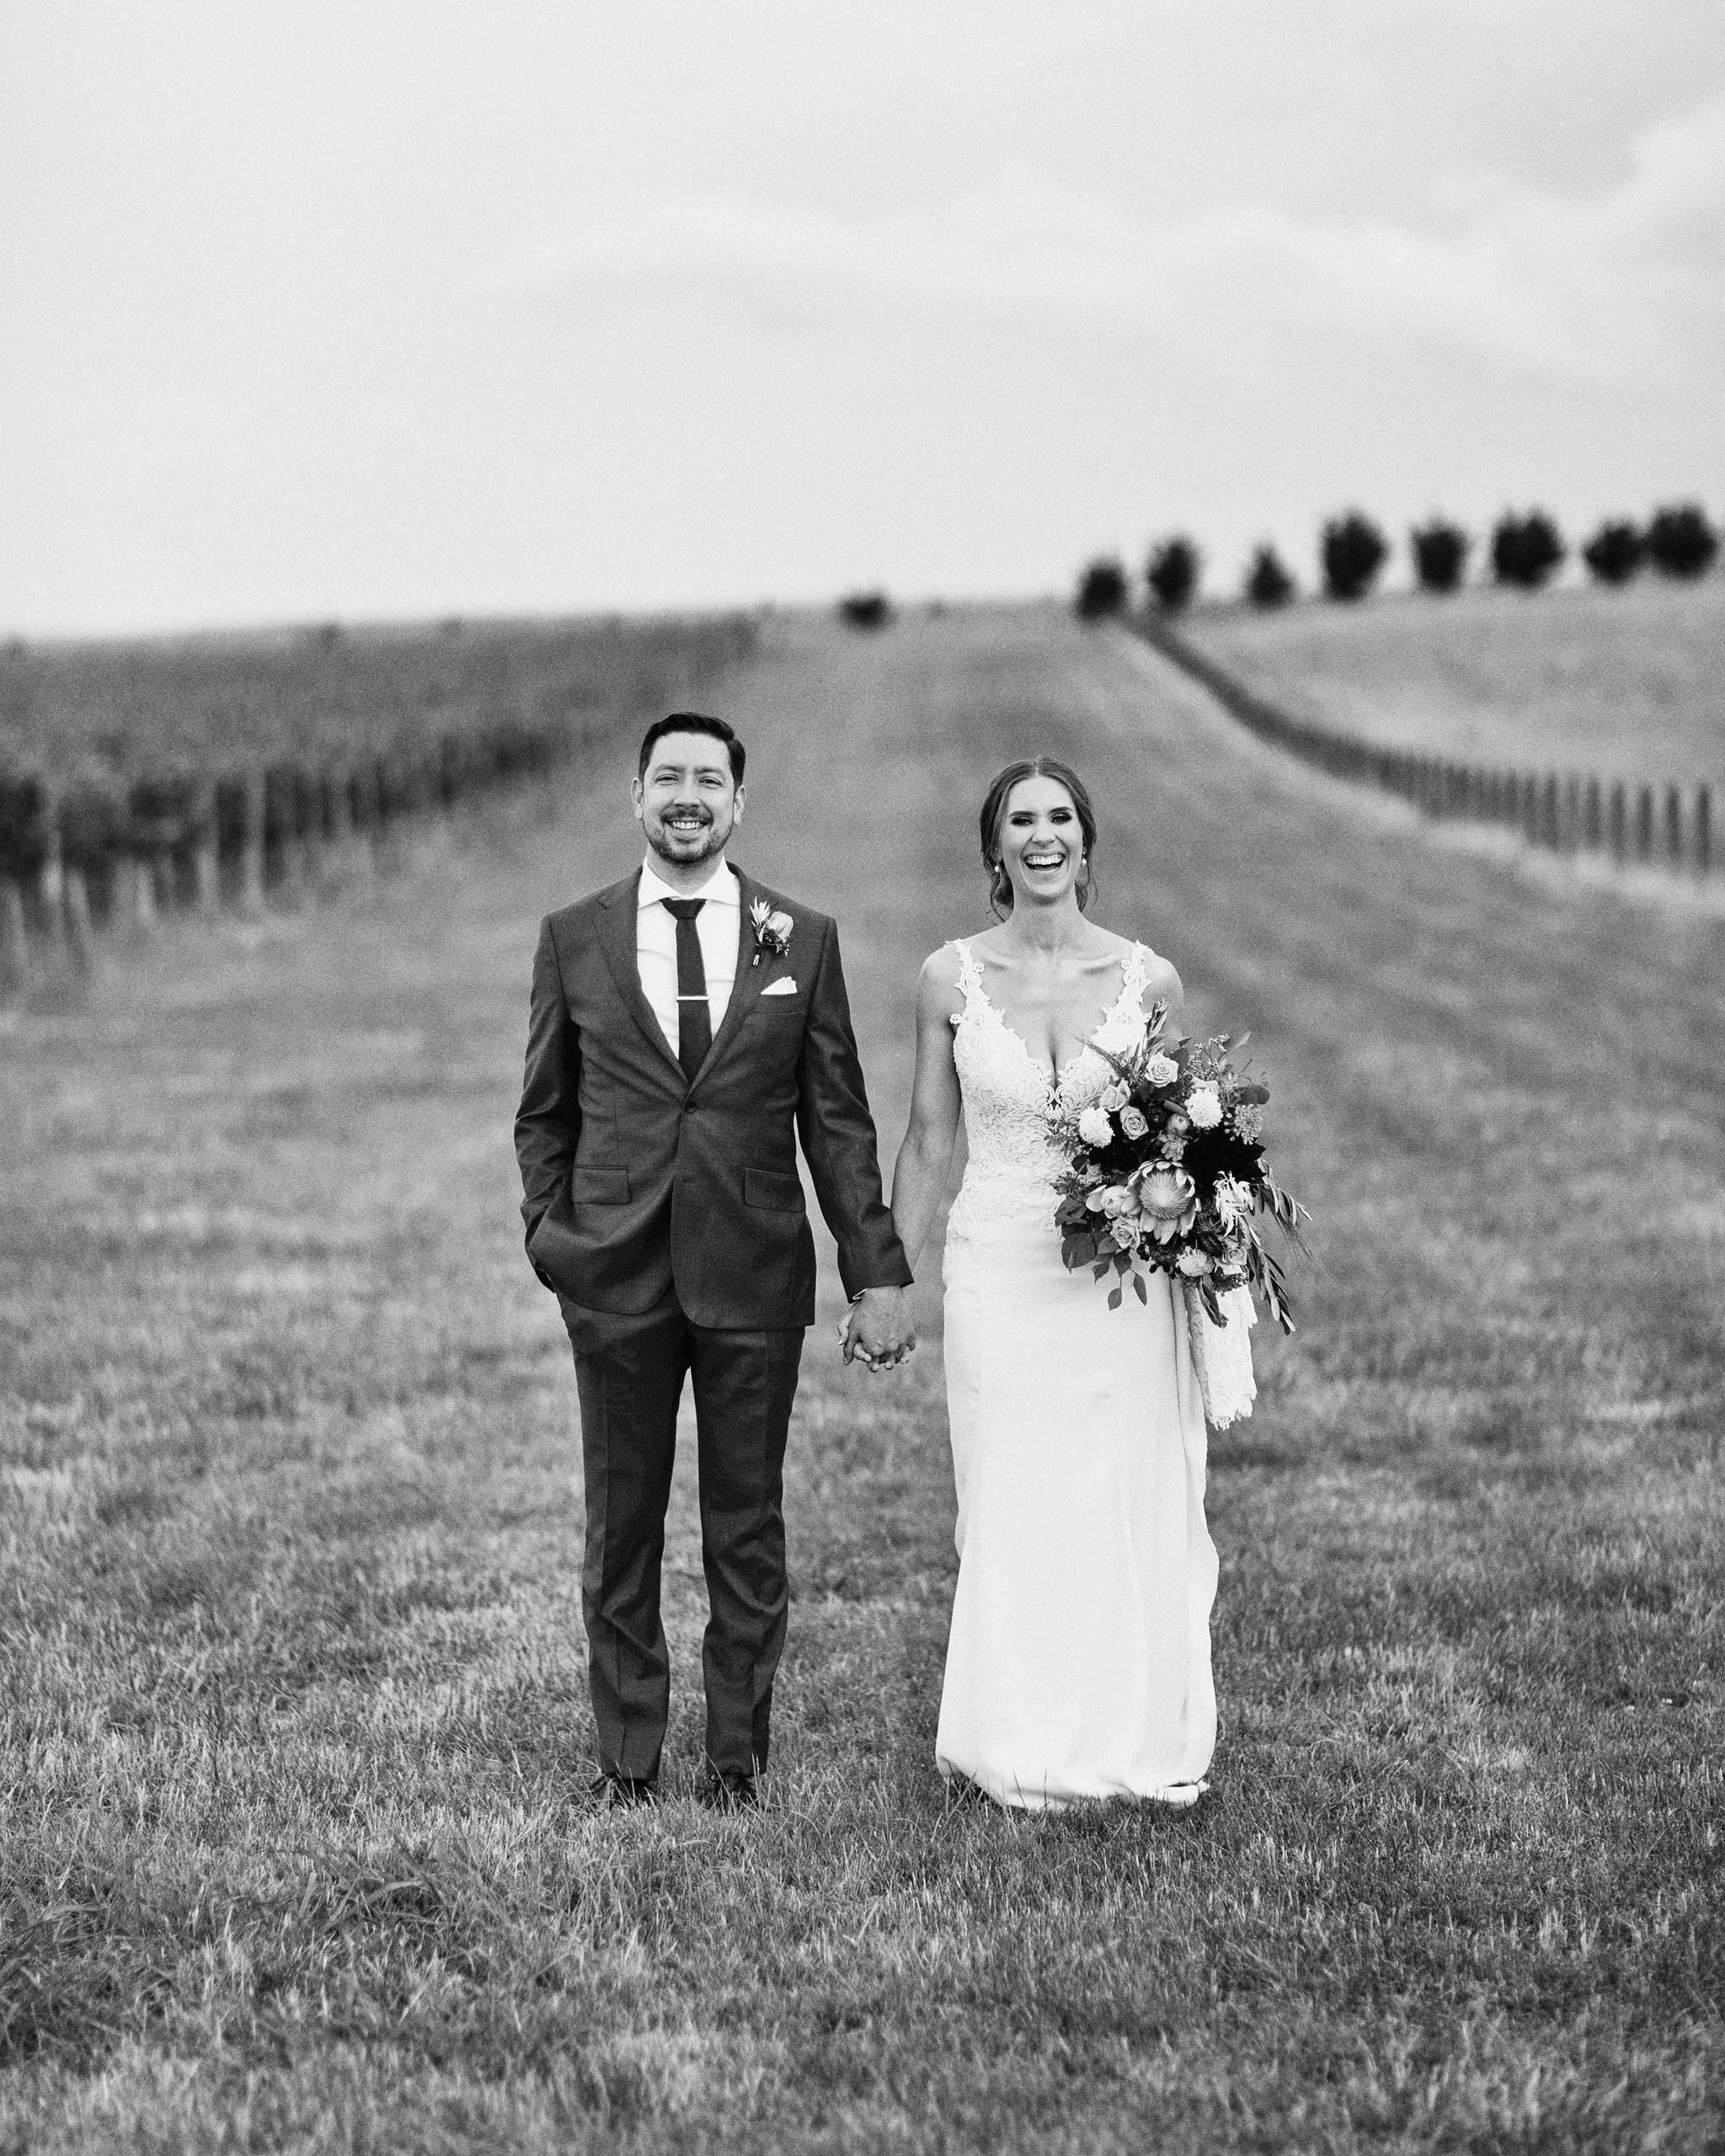 Zonzo estate wedding formal portrait vineyard